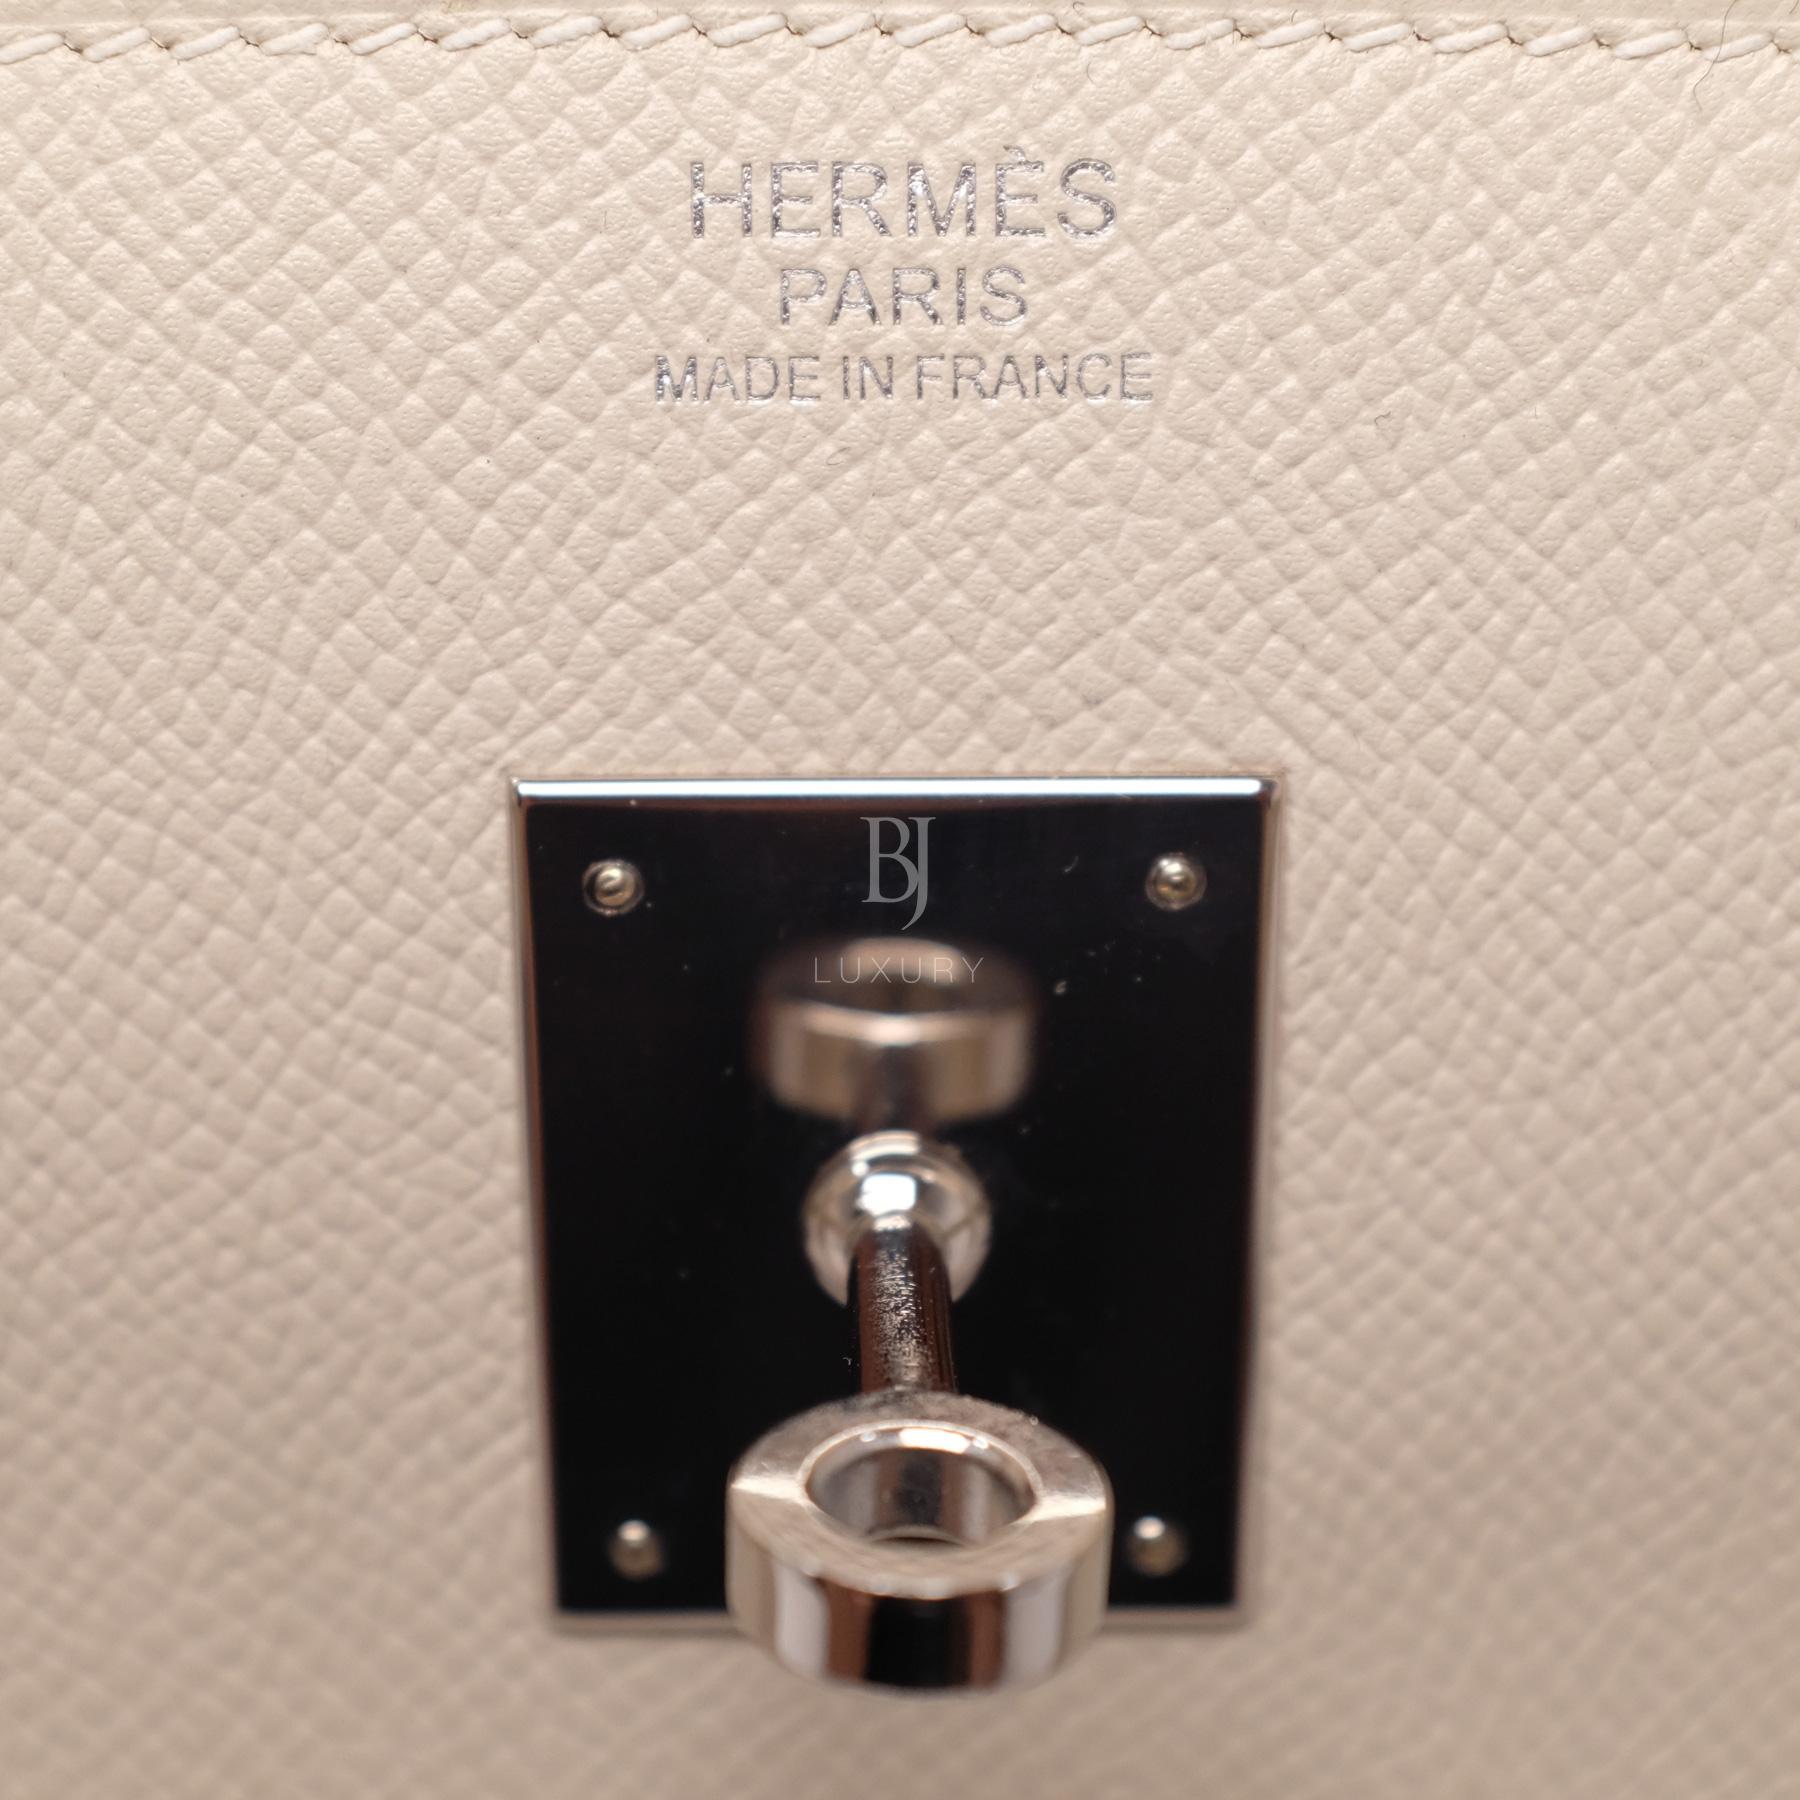 Hermes Birkin 30 Epsom Craie Palladium BJ Luxury 3.jpg